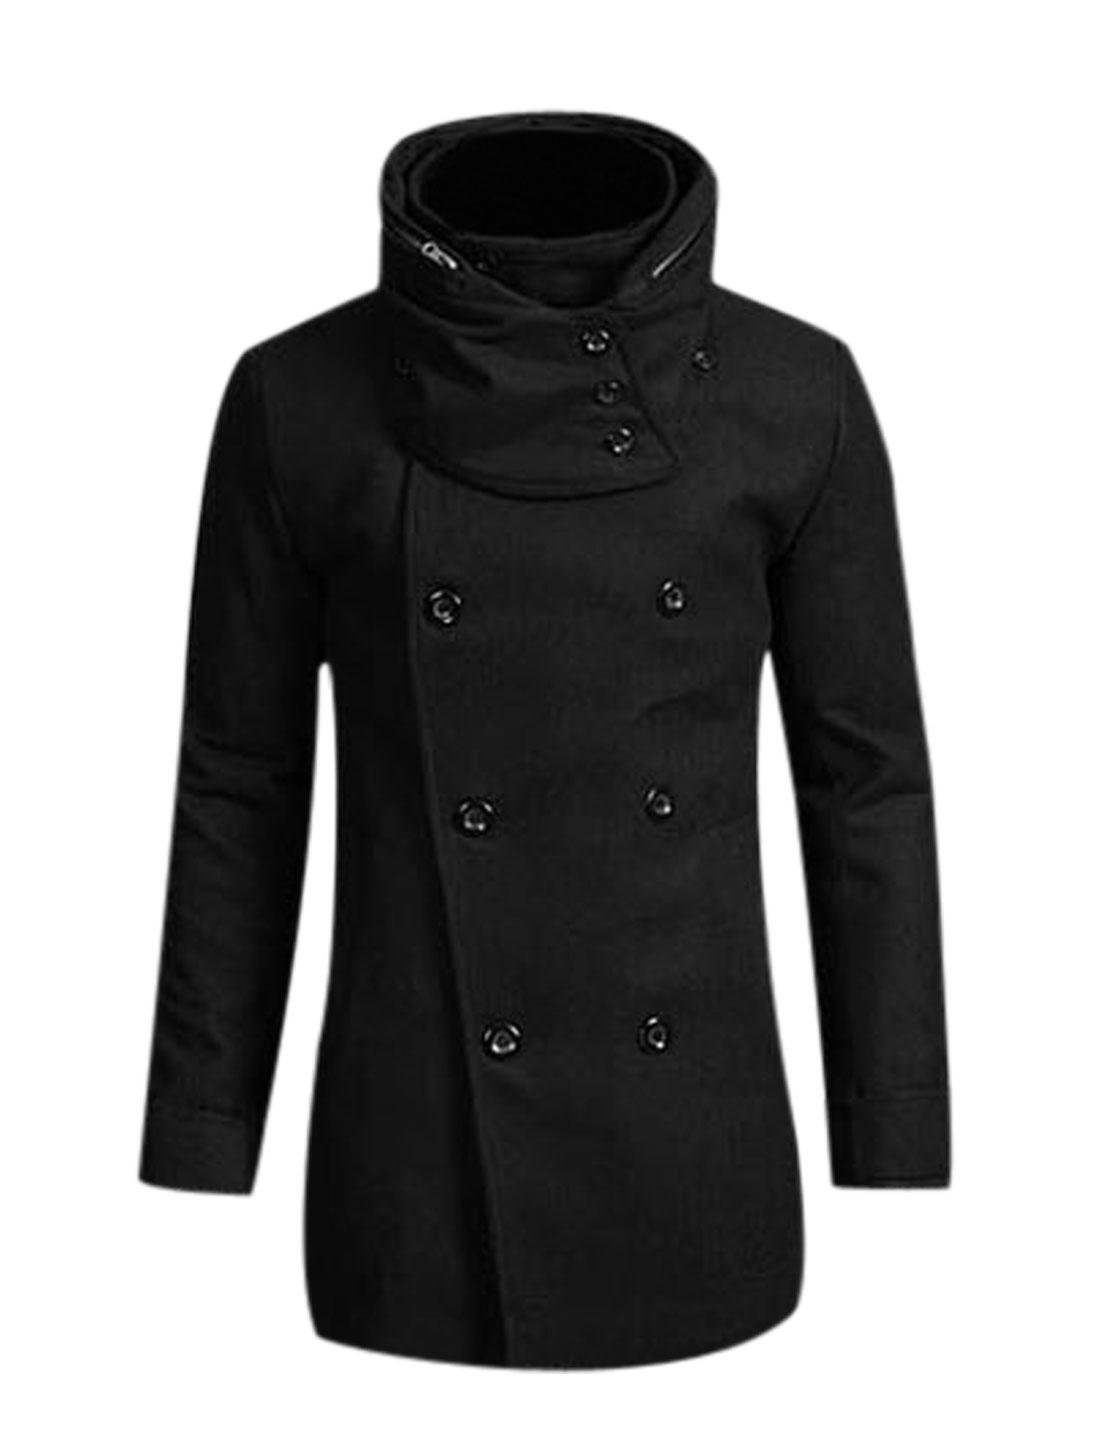 Men Convertible Collar Button Down Fashion Trench Jacket Black M